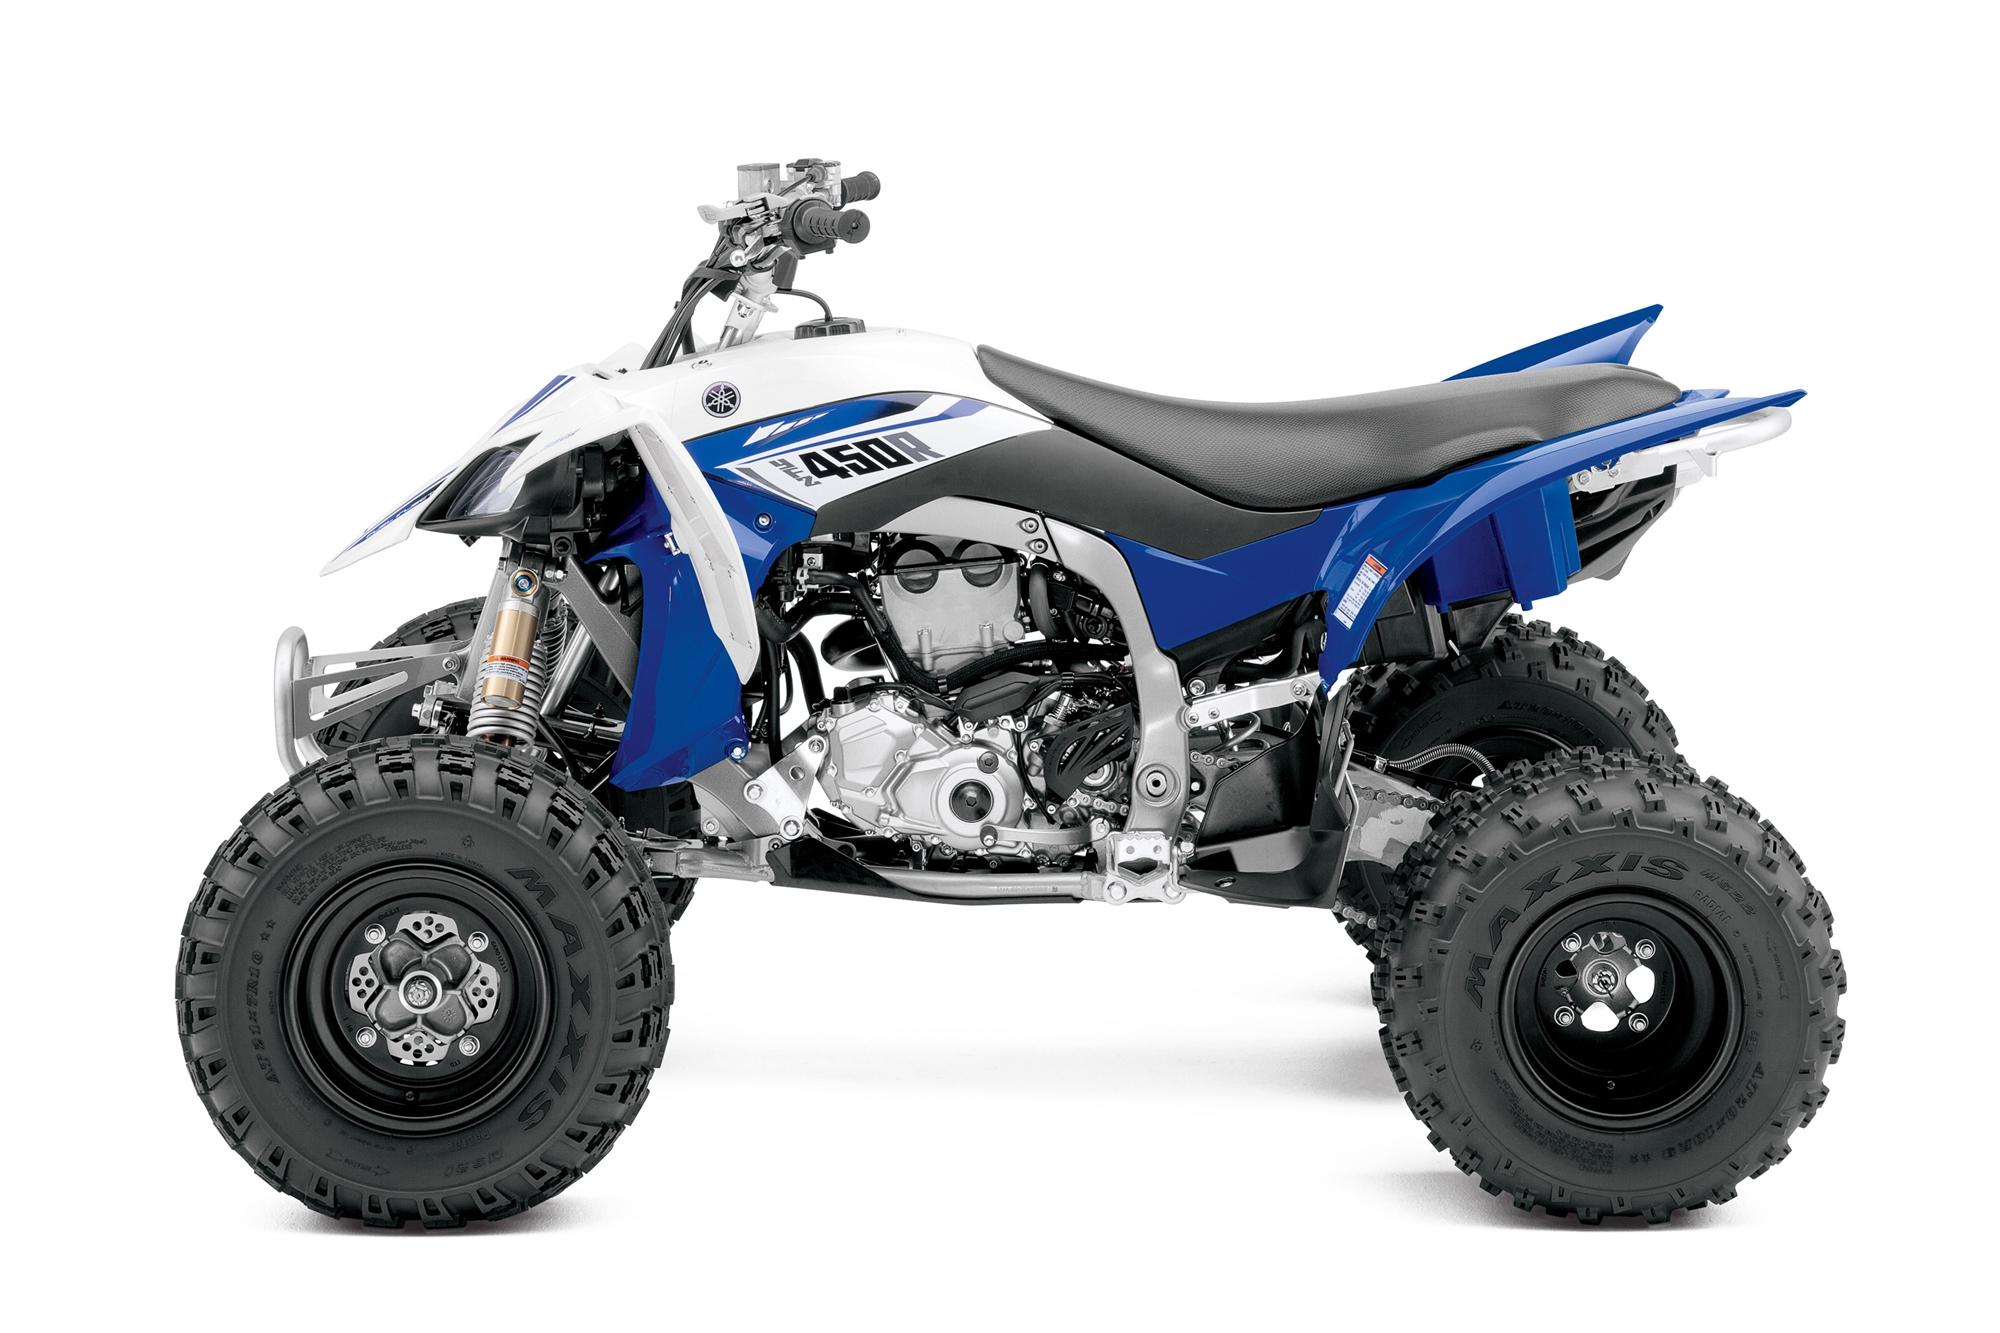 Yamaha Raptor Aftermarket Parts